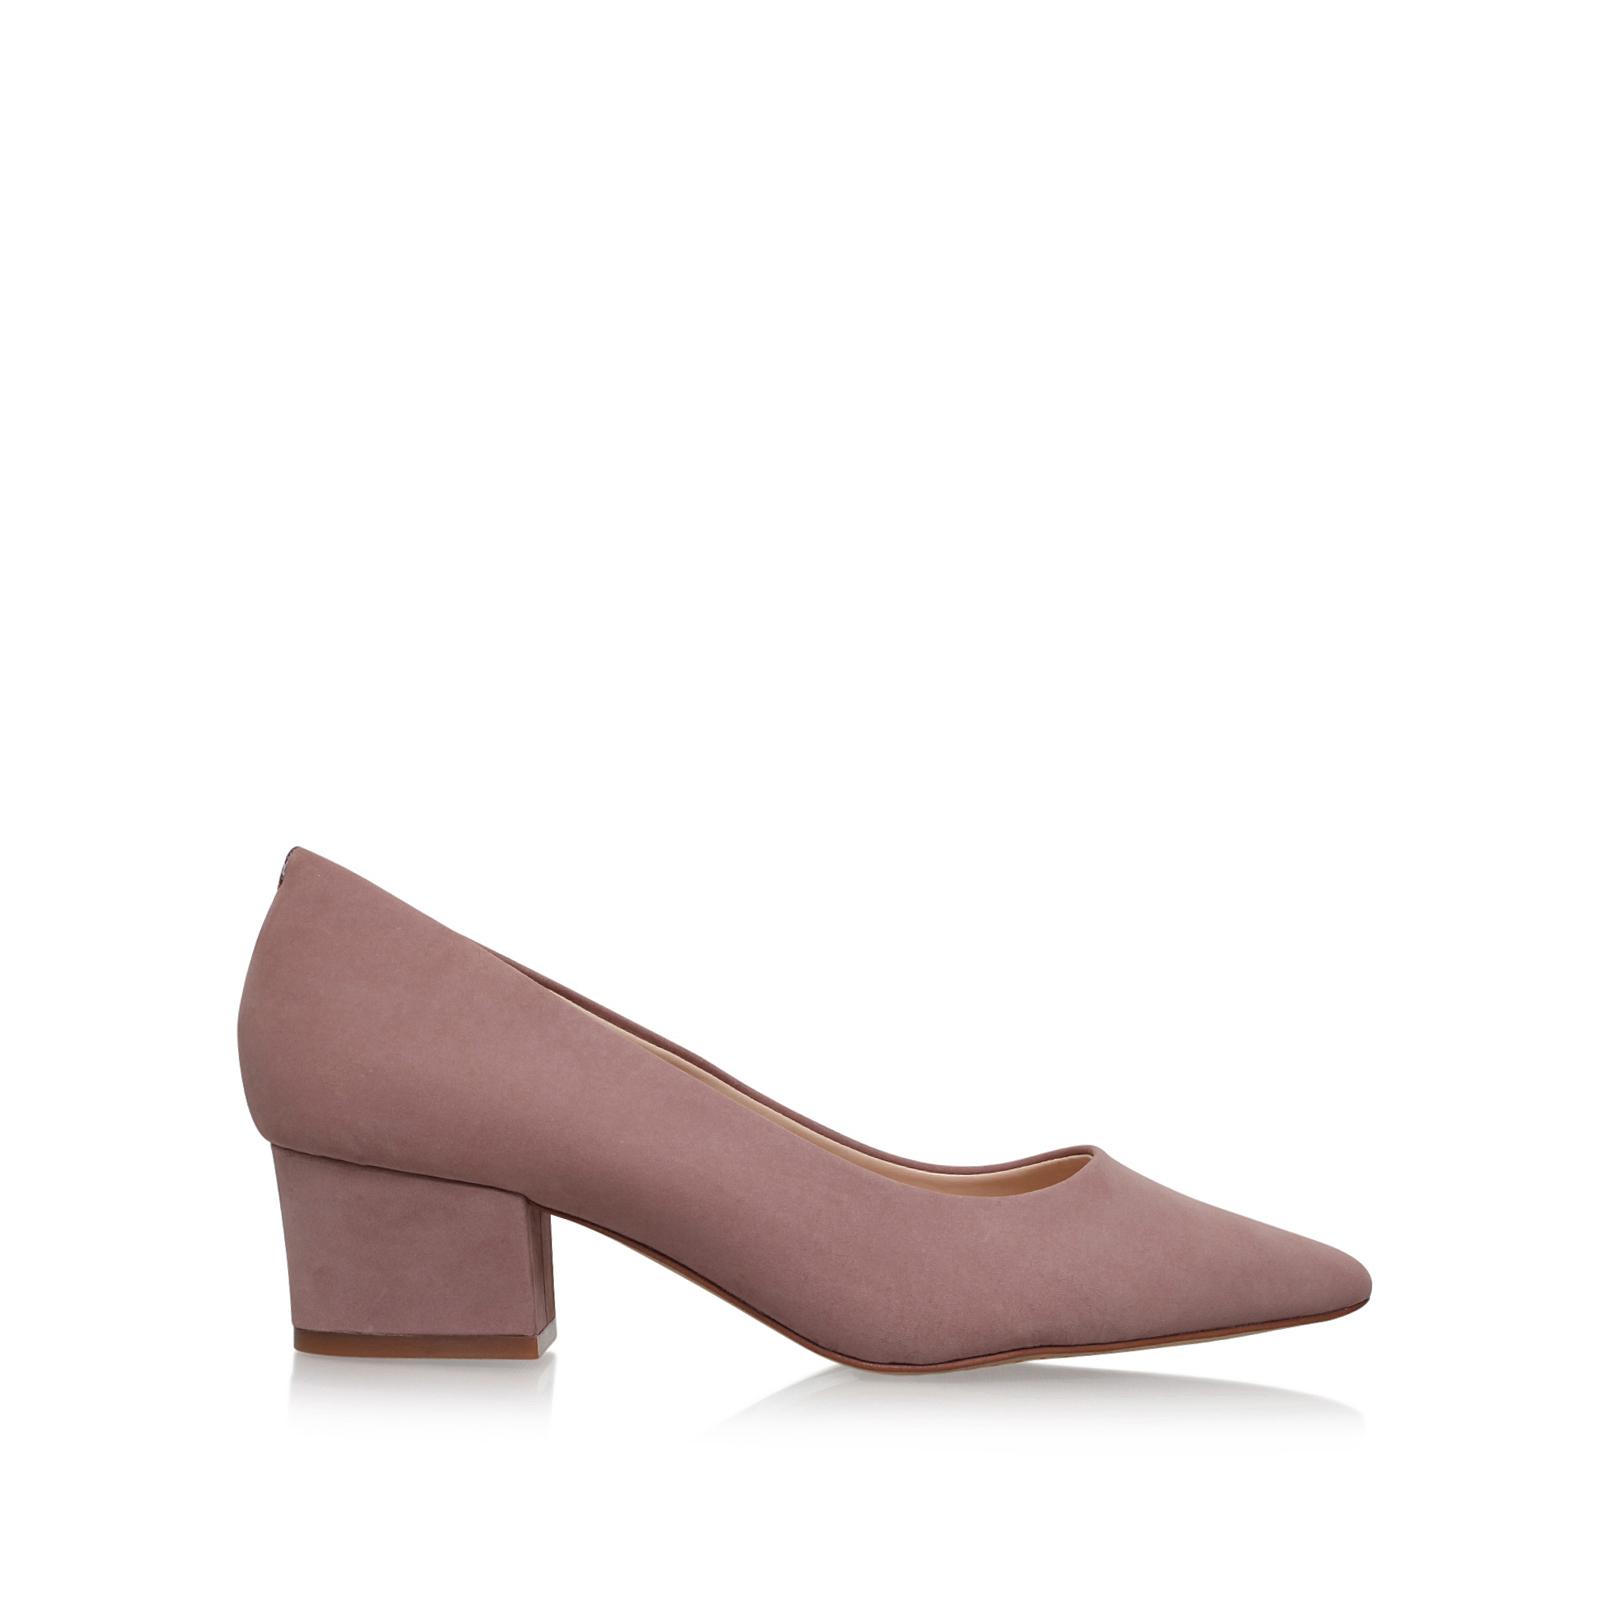 JAIDA Vince Camuto Jaida Pale Pink Mid Heel Court Shoes Block Heel by VINCE  CAMUTO b621a74e37f4